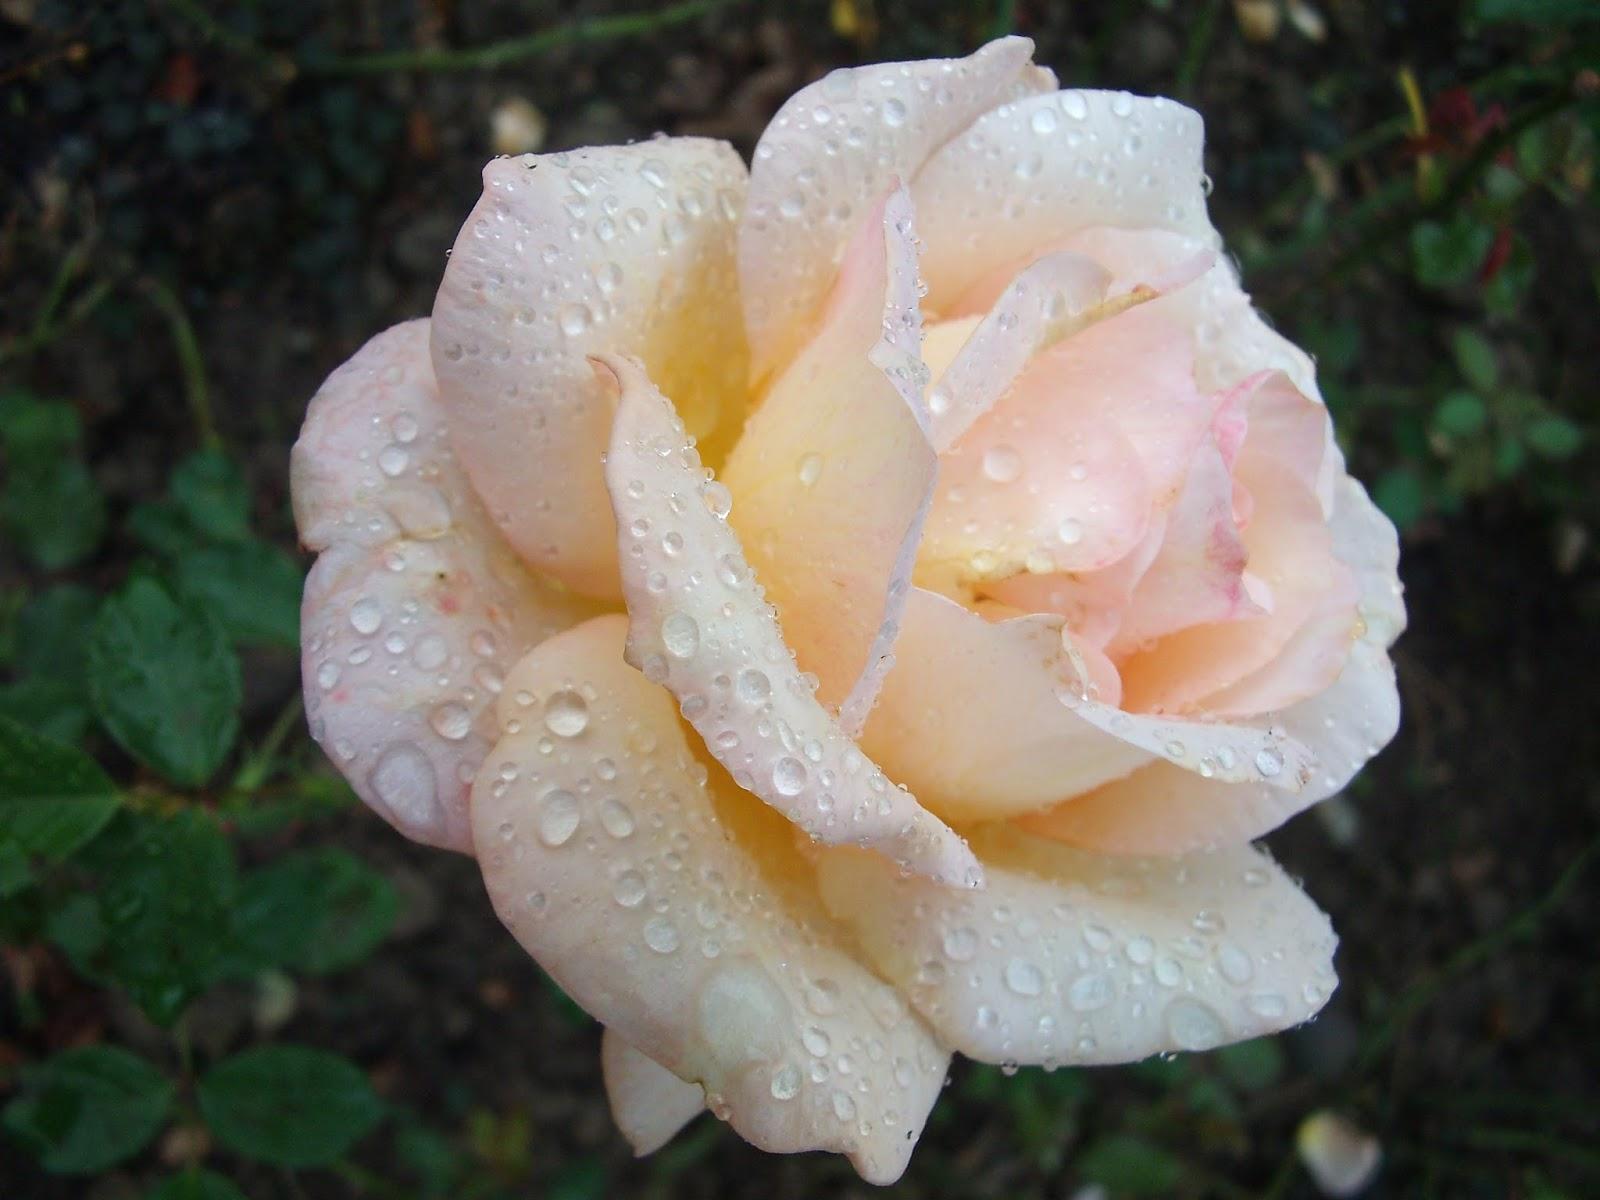 http://3.bp.blogspot.com/-4Rd0wq3DO1g/VcbjfKfRYzI/AAAAAAAAW4I/nztmsdyzz6M/s1600/rose-blanche-mouillee_1.jpg